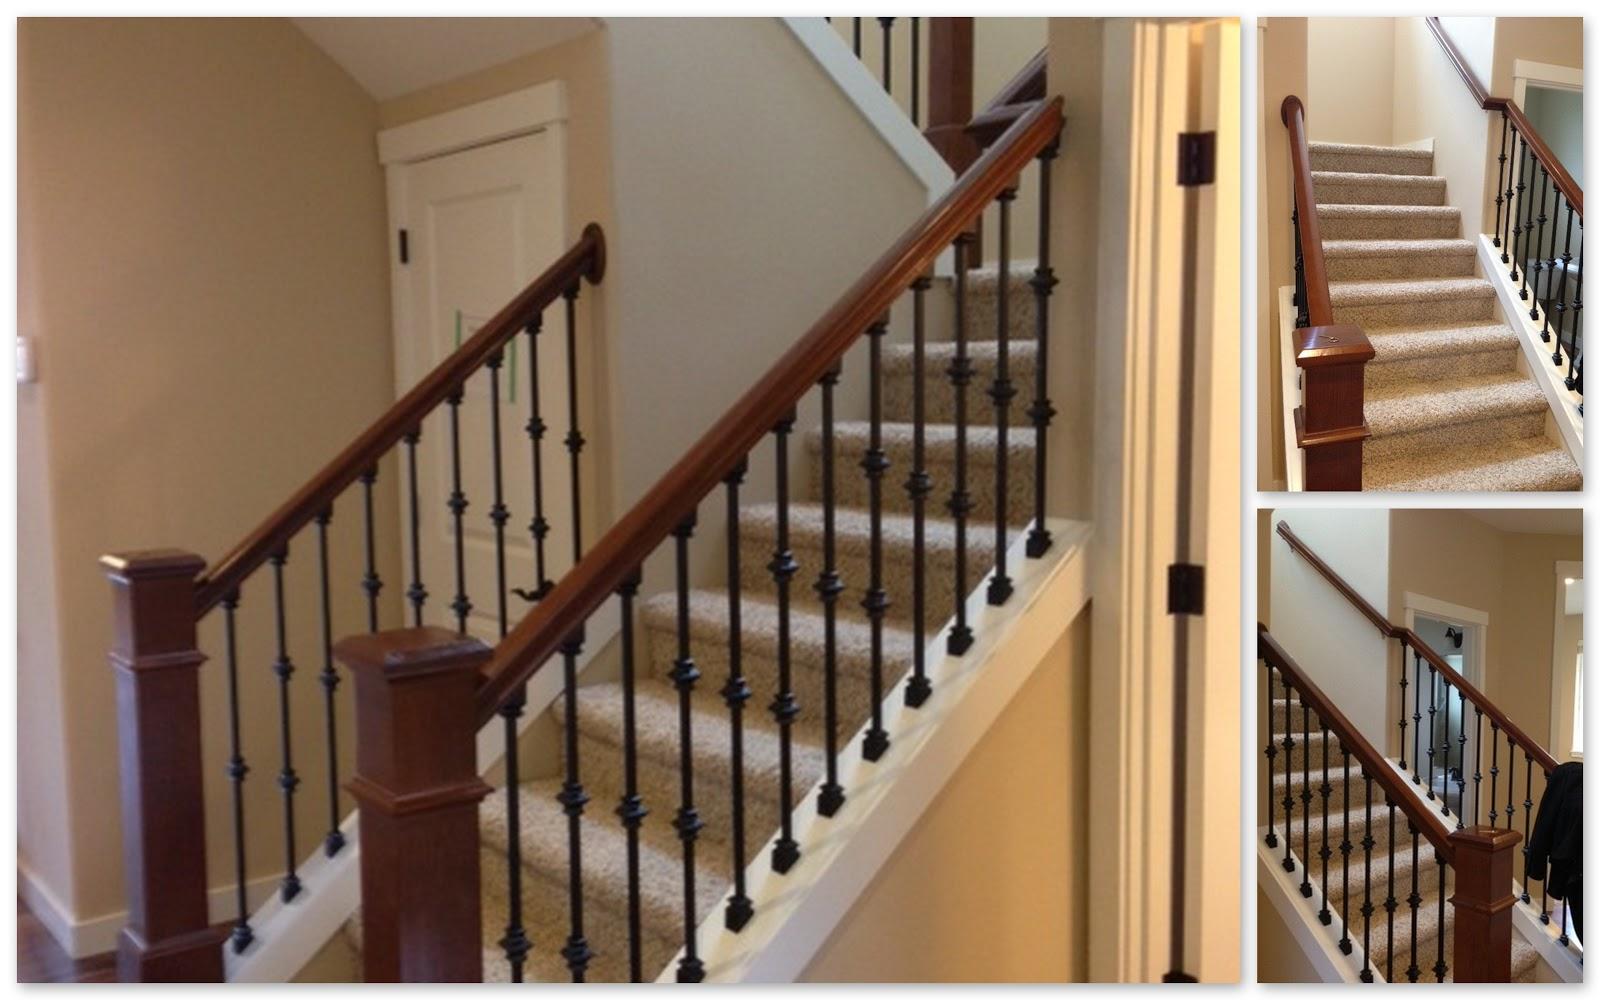 Home Depot Interior Stair Railings Home Depot Stair Railings Interior A More Decor Stair Rail